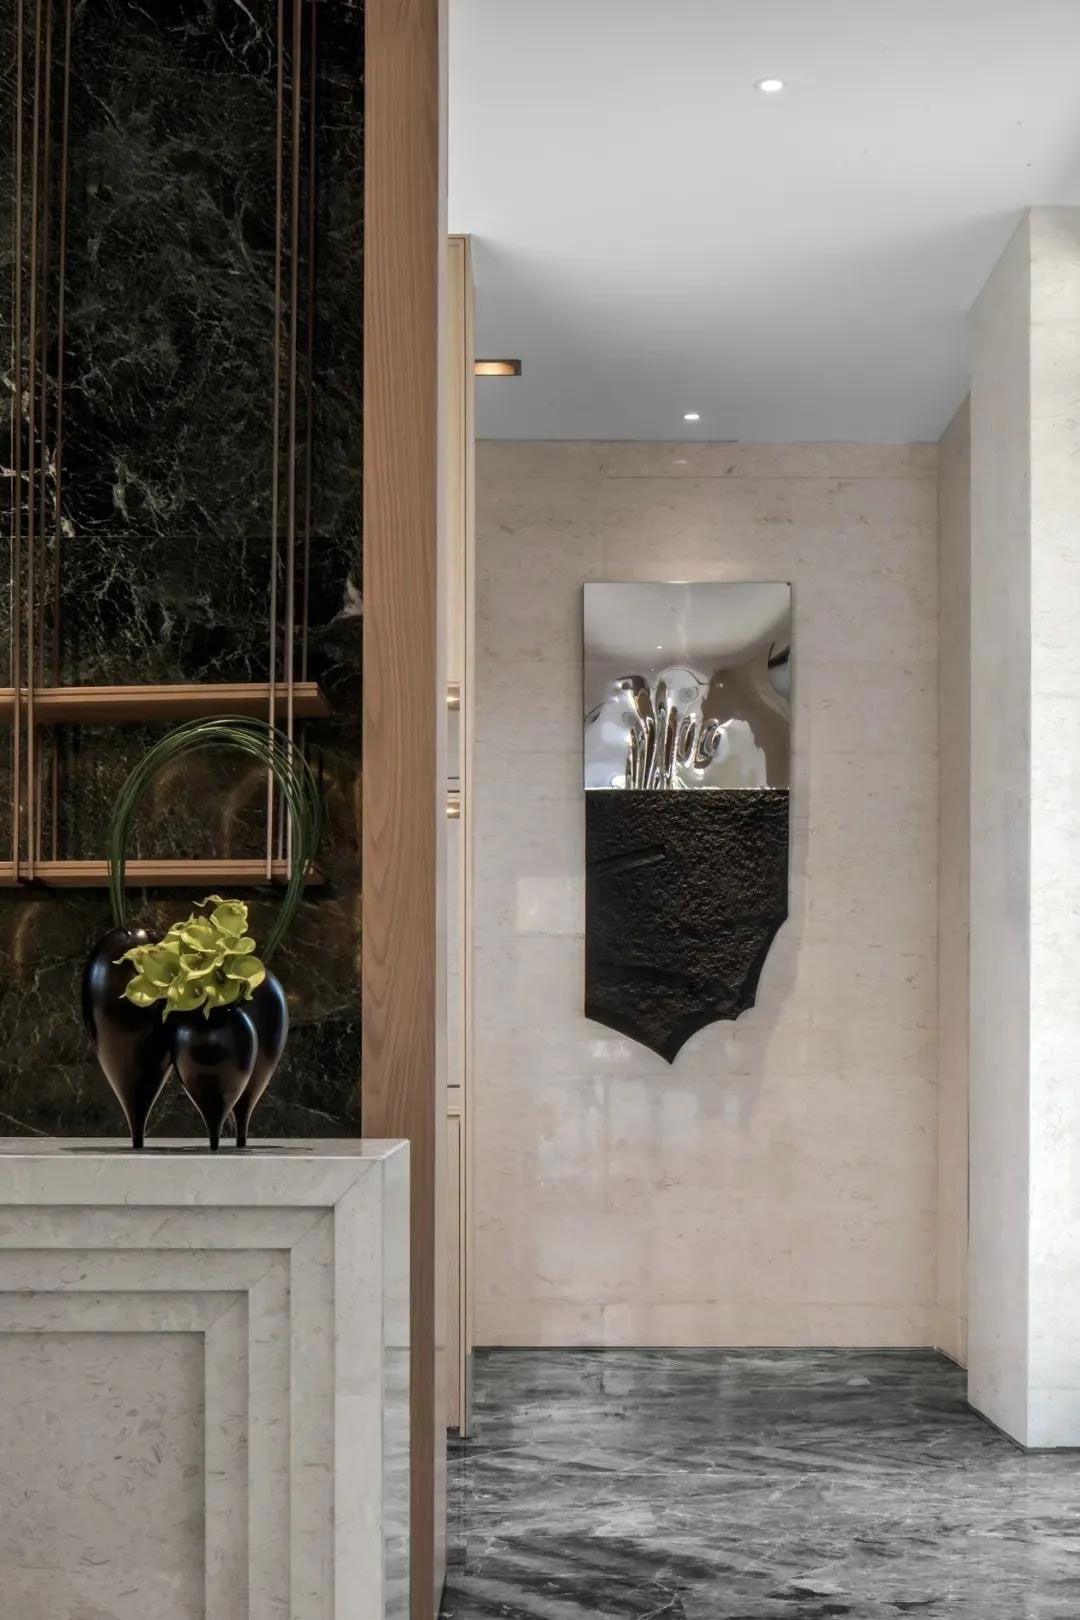 #marble #marbletiles #flooring #floortiles #walltiles #wallcaldding #marbledesign #decoration #luxurydesign #luxurydecor #luxurymarble